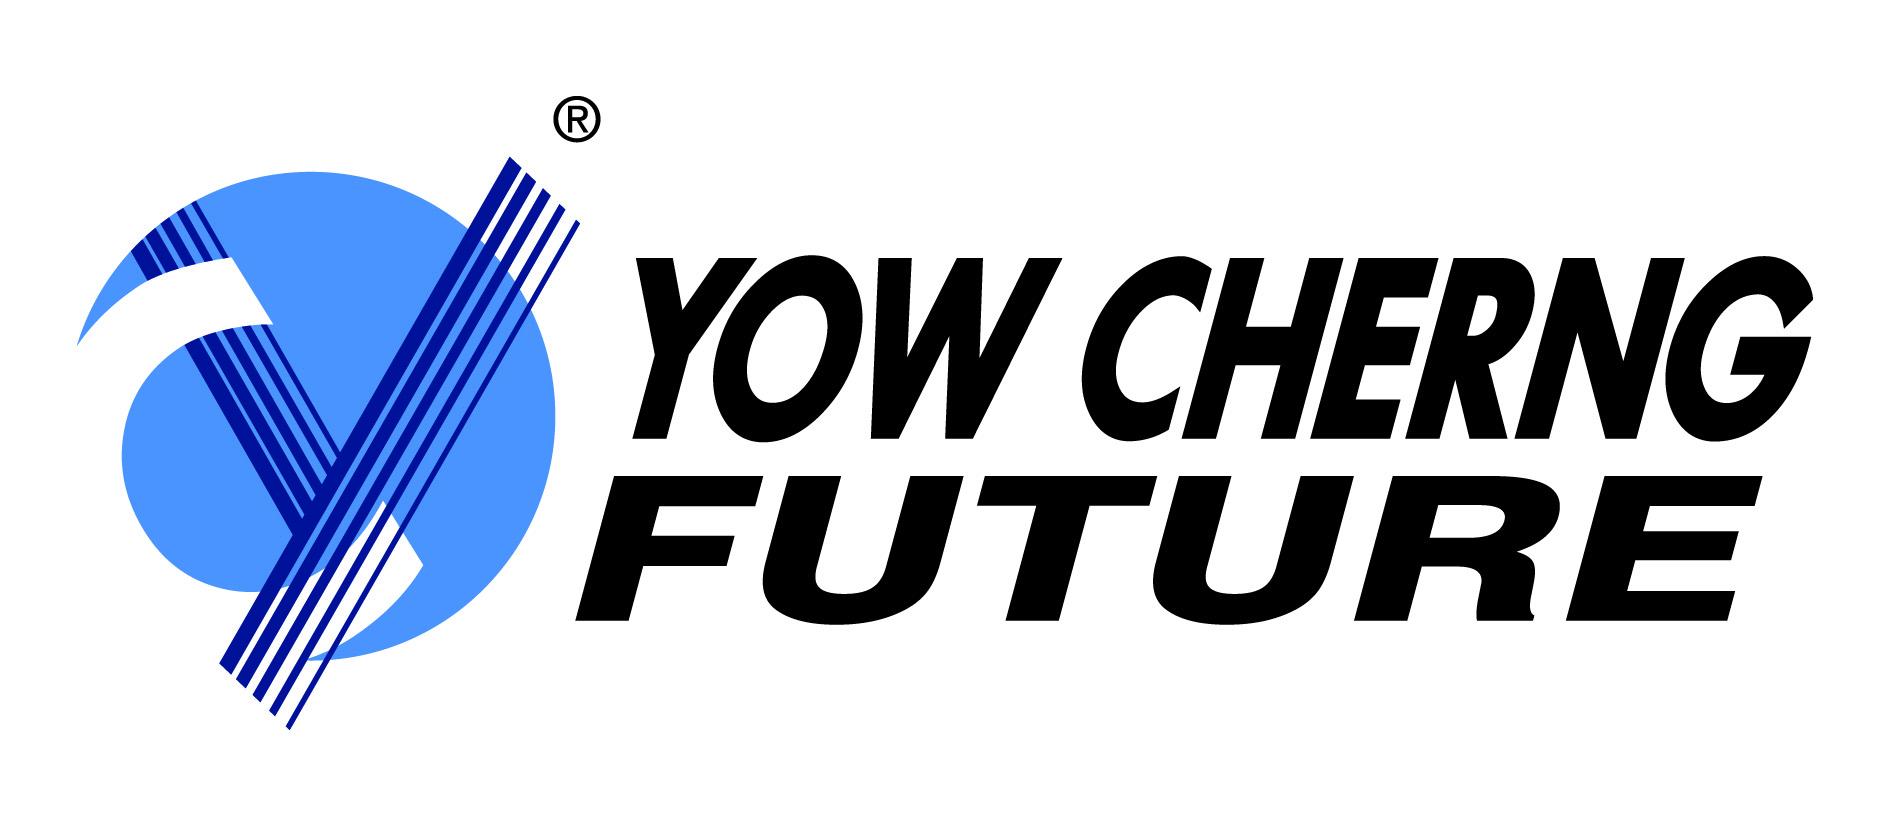 YOW CHERNG MACHINERY CO., LTD.